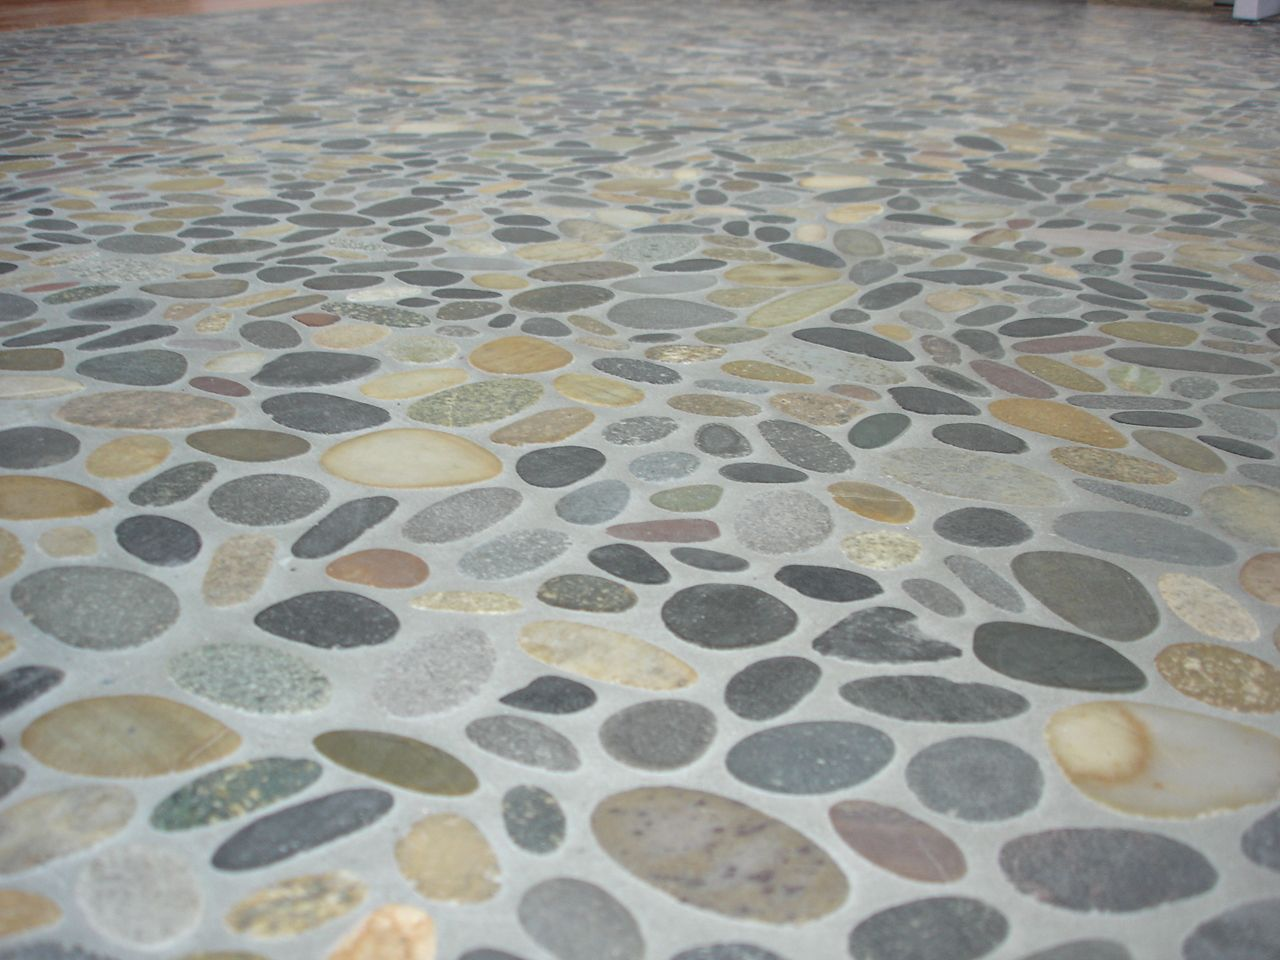 River Rock Tile Flooring U2013 | Home Interior Design IdeasHome .